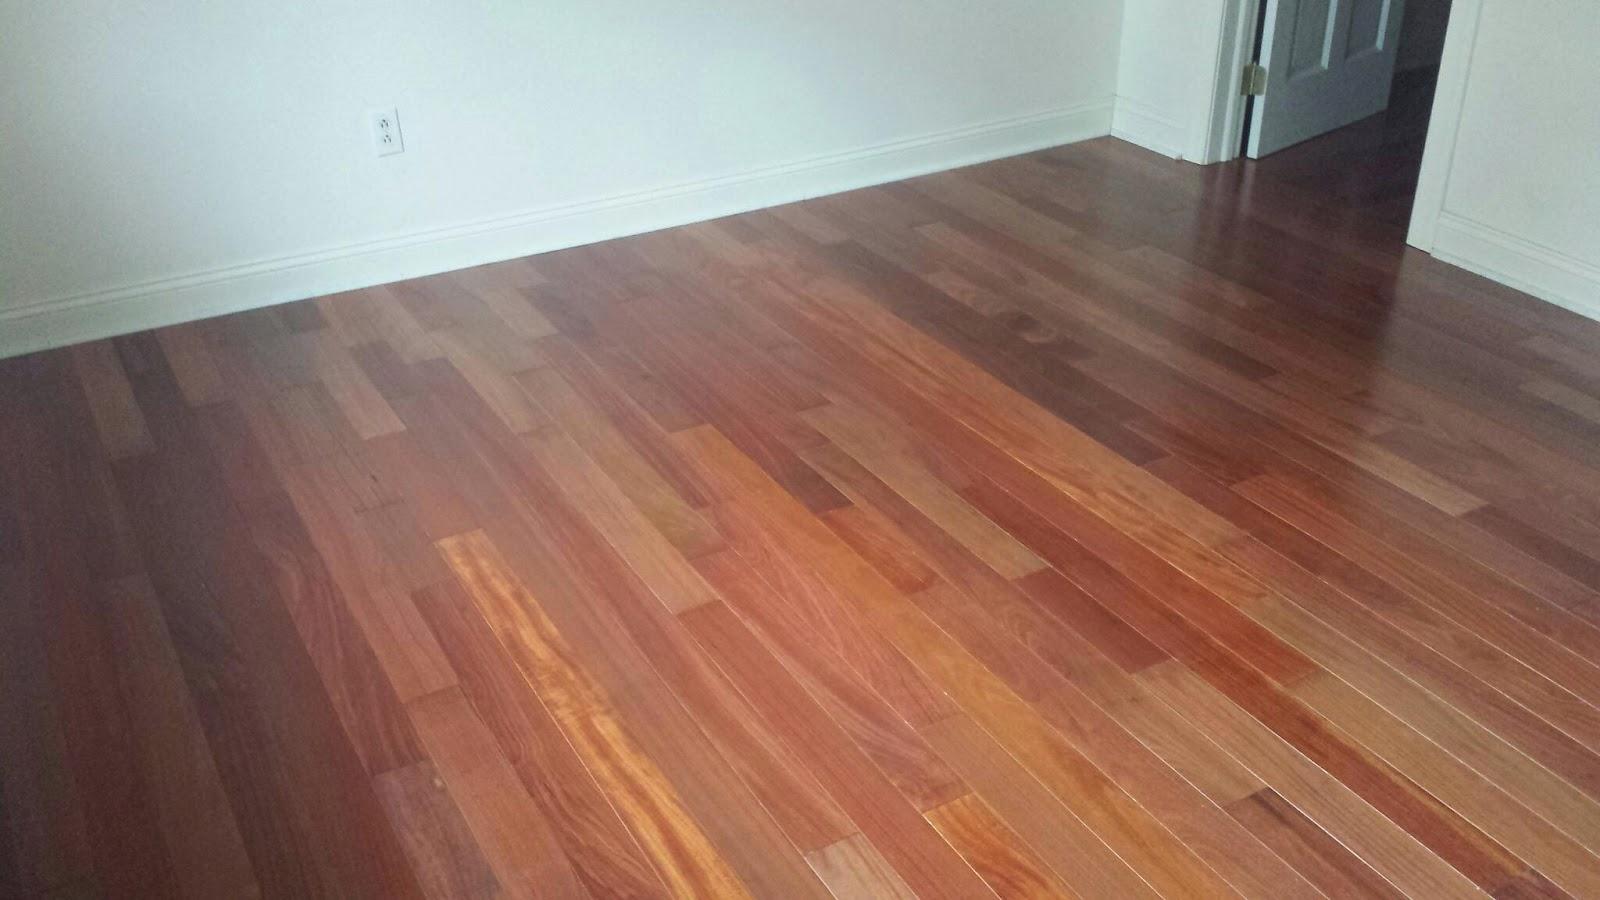 Hardwood floor new jersey carpet vidalondon for Wood floor installation nj